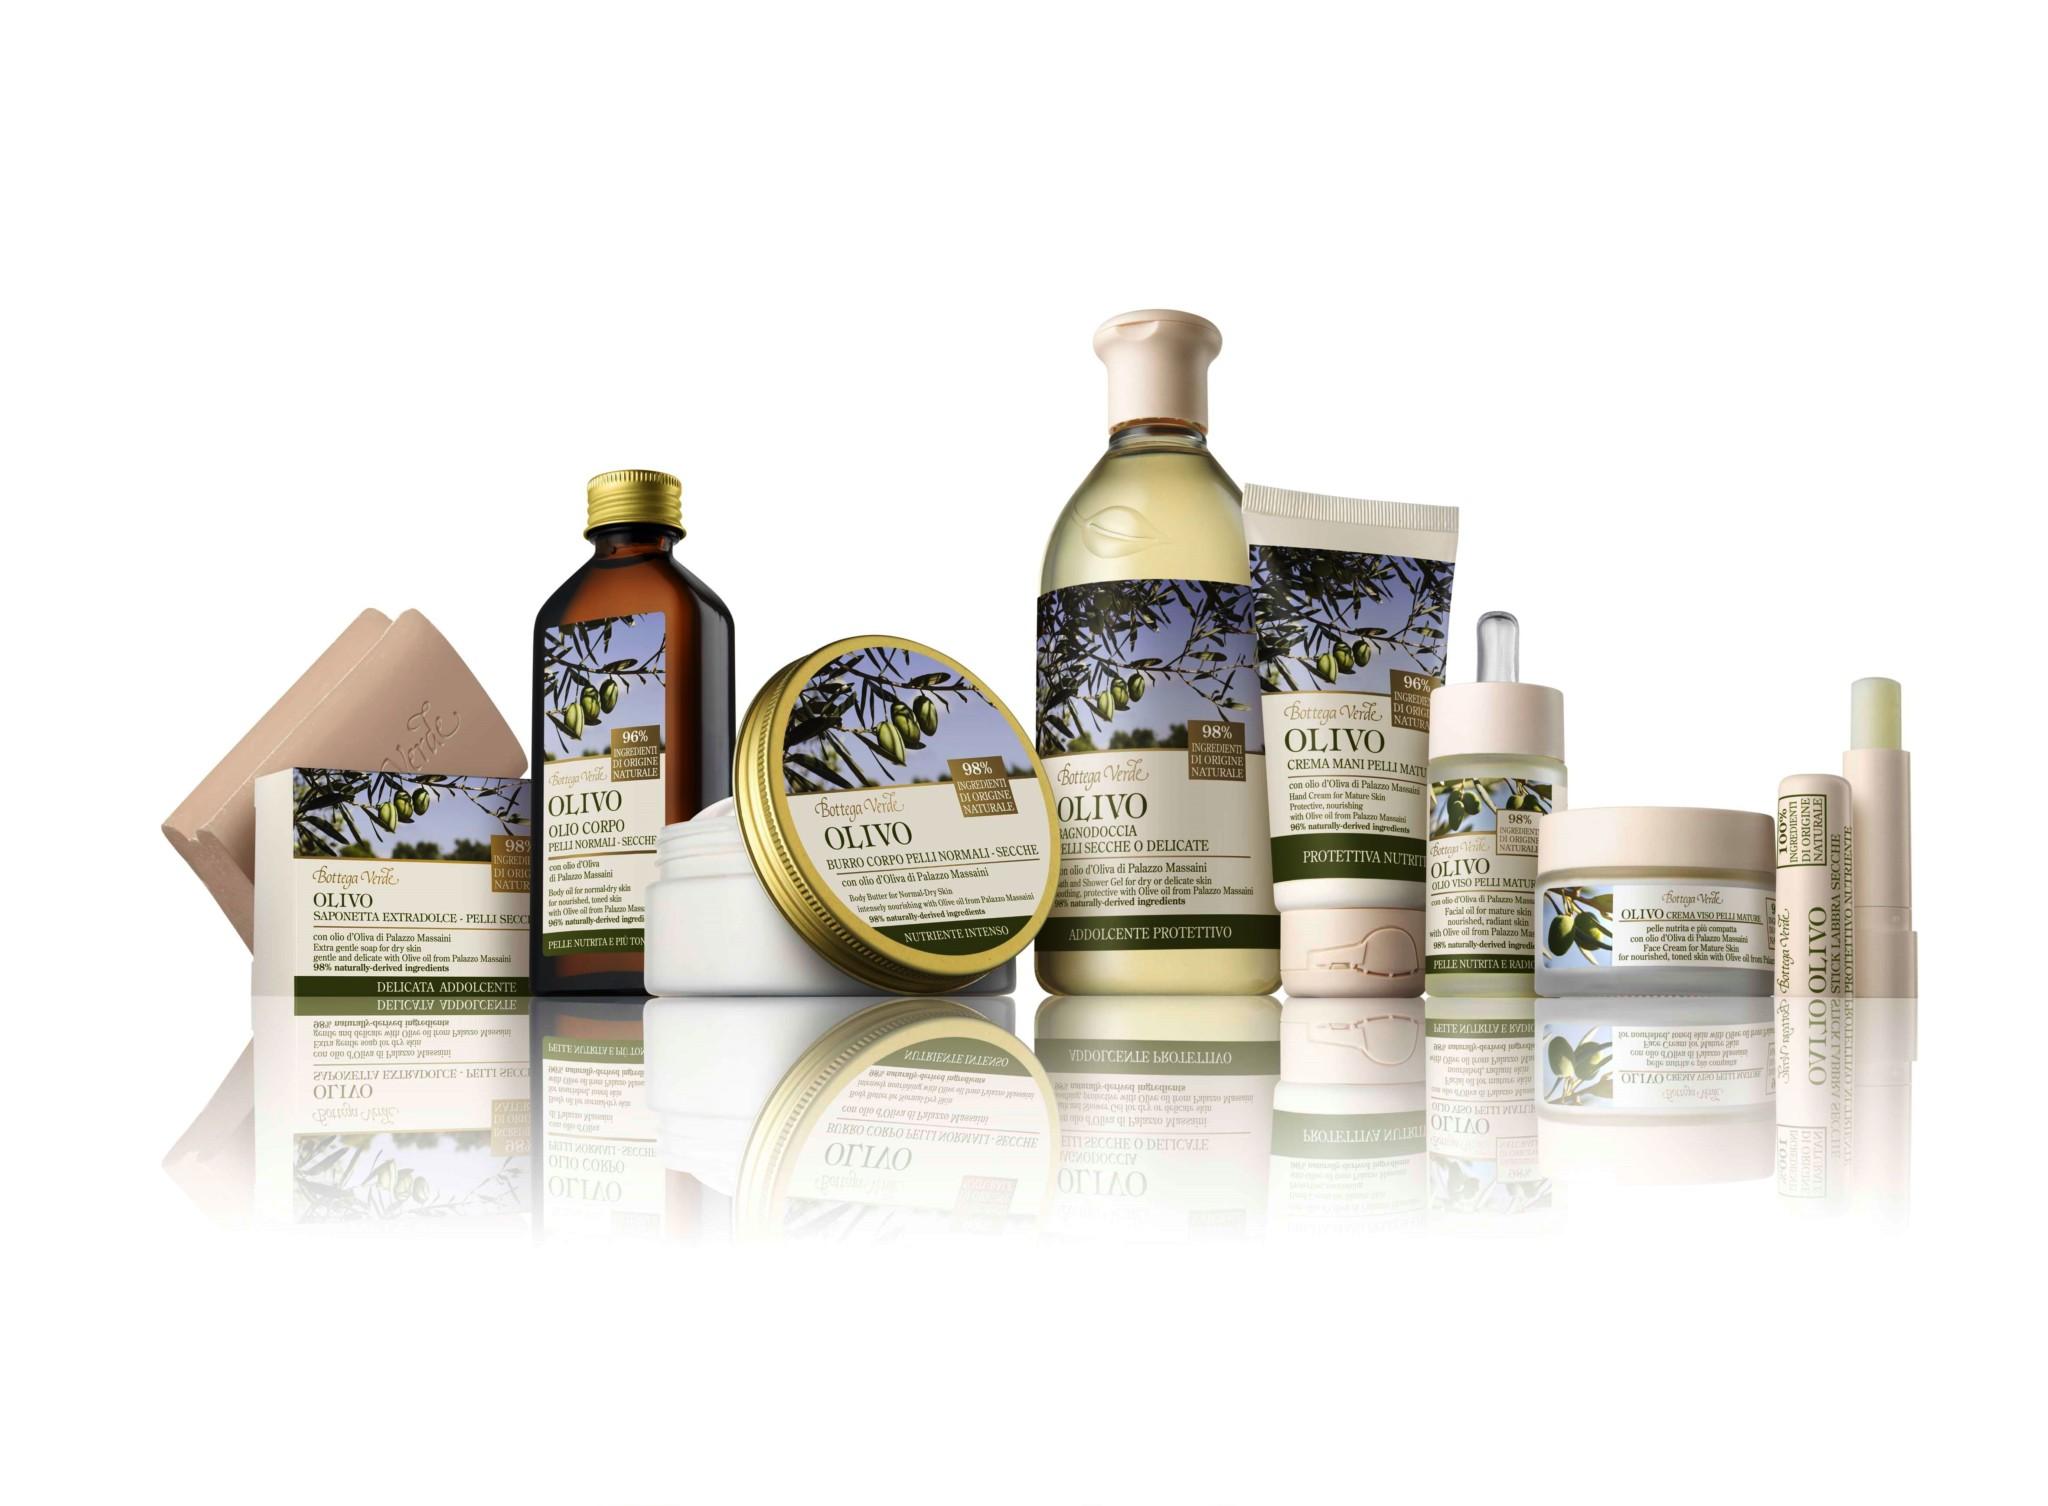 Bagno Doccia Bottega Verde : Bottega verde: nasce olivo con olio doliva di palazzo massaini